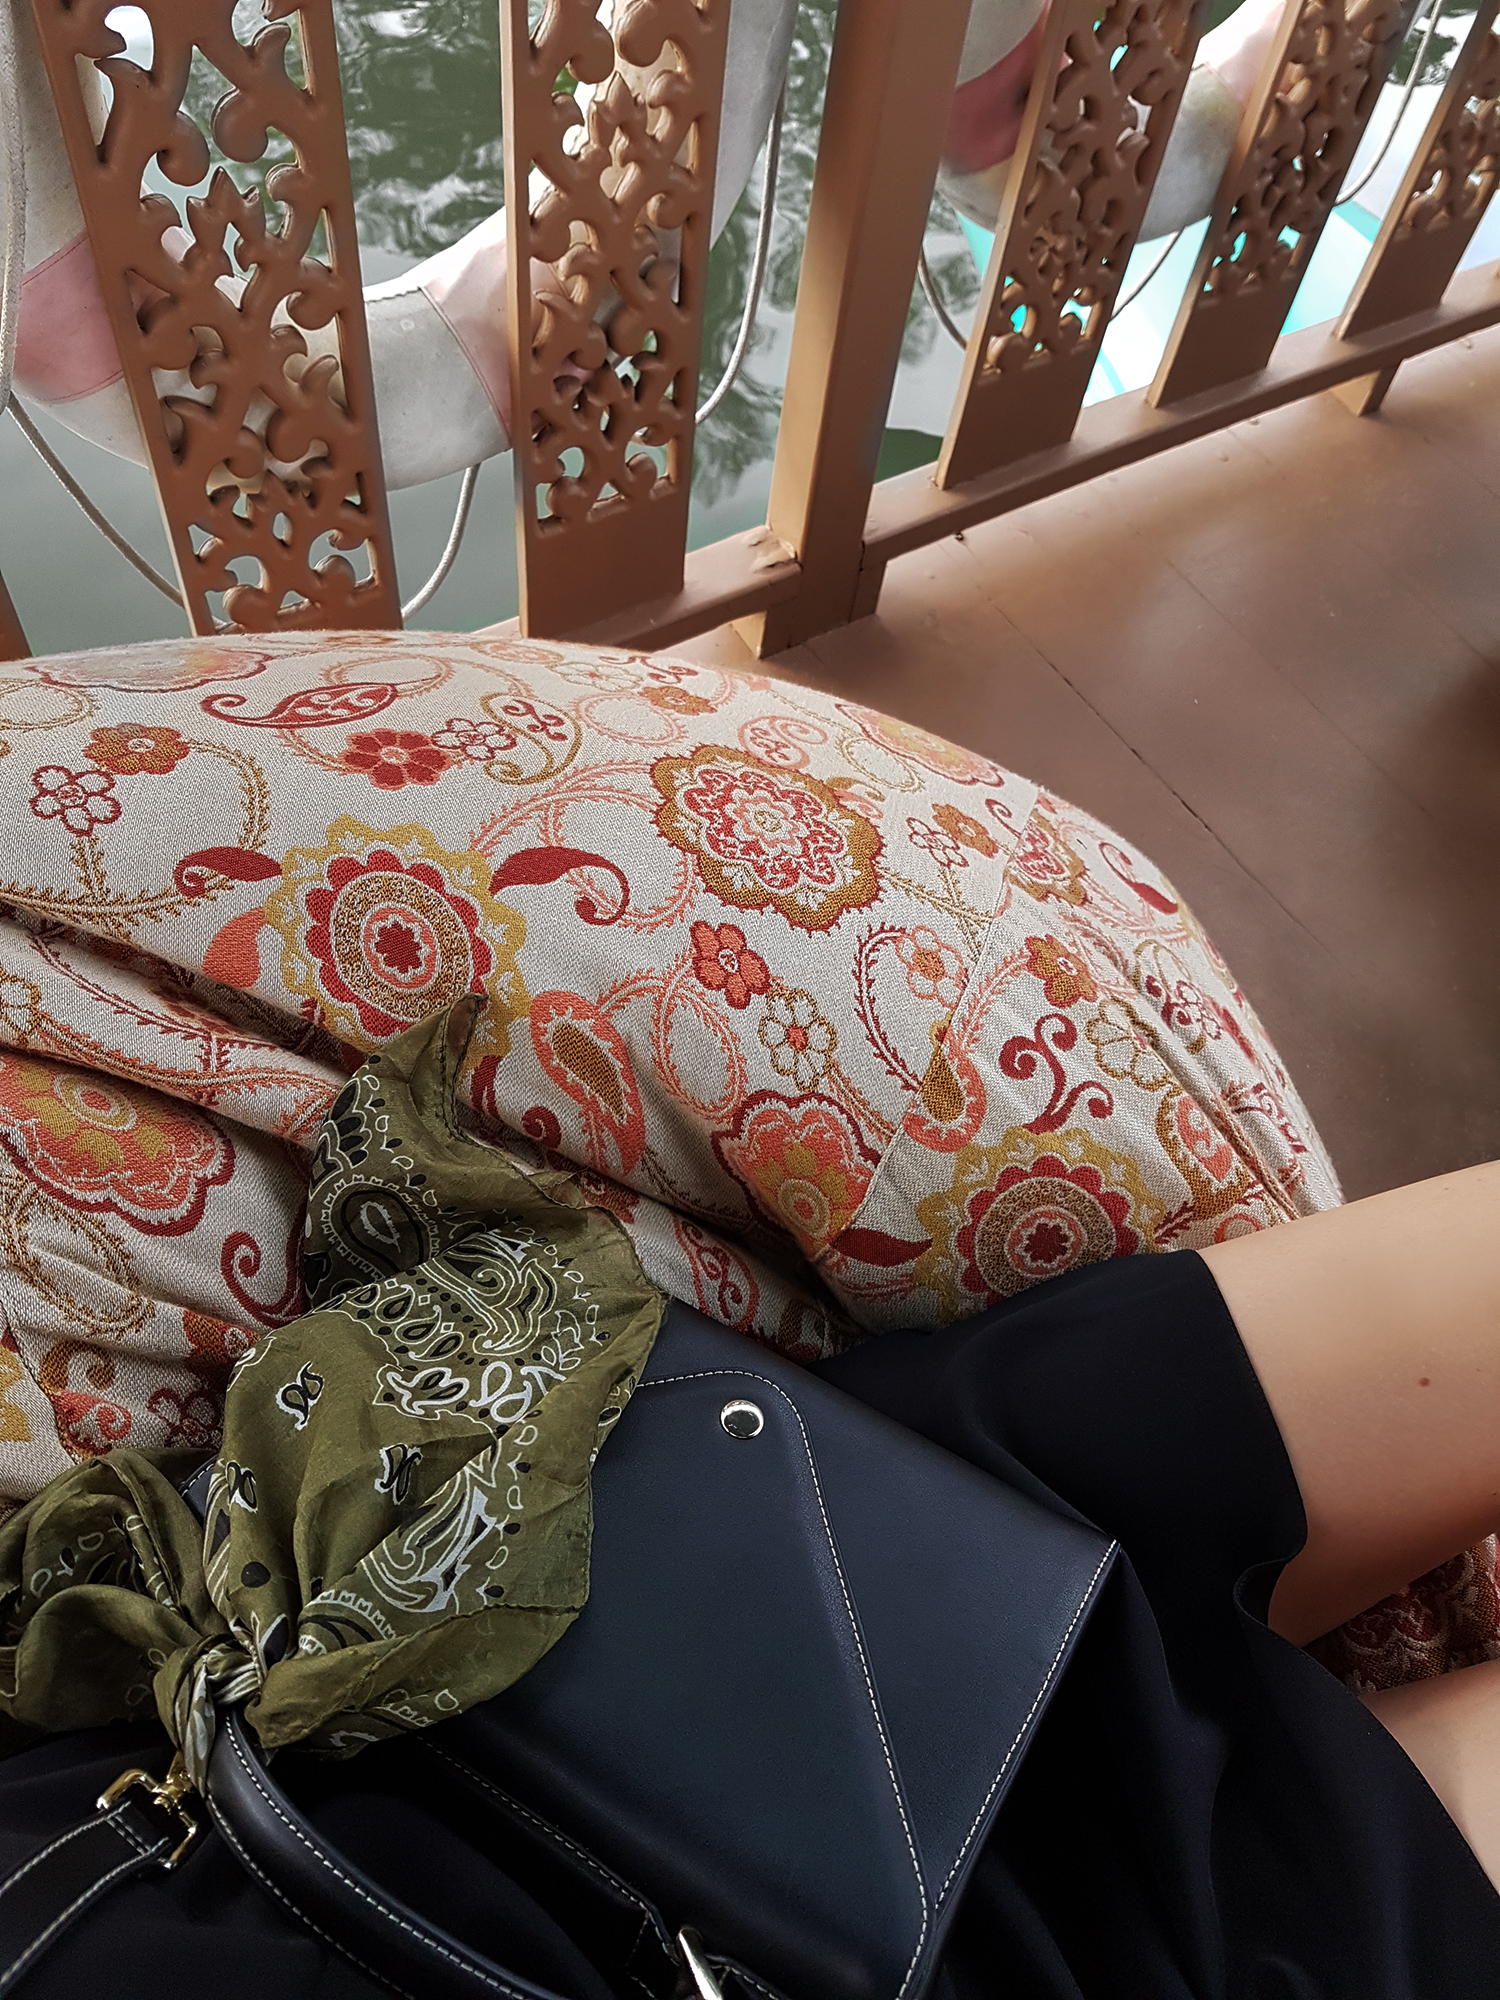 wearemad cassia phuket.jpg